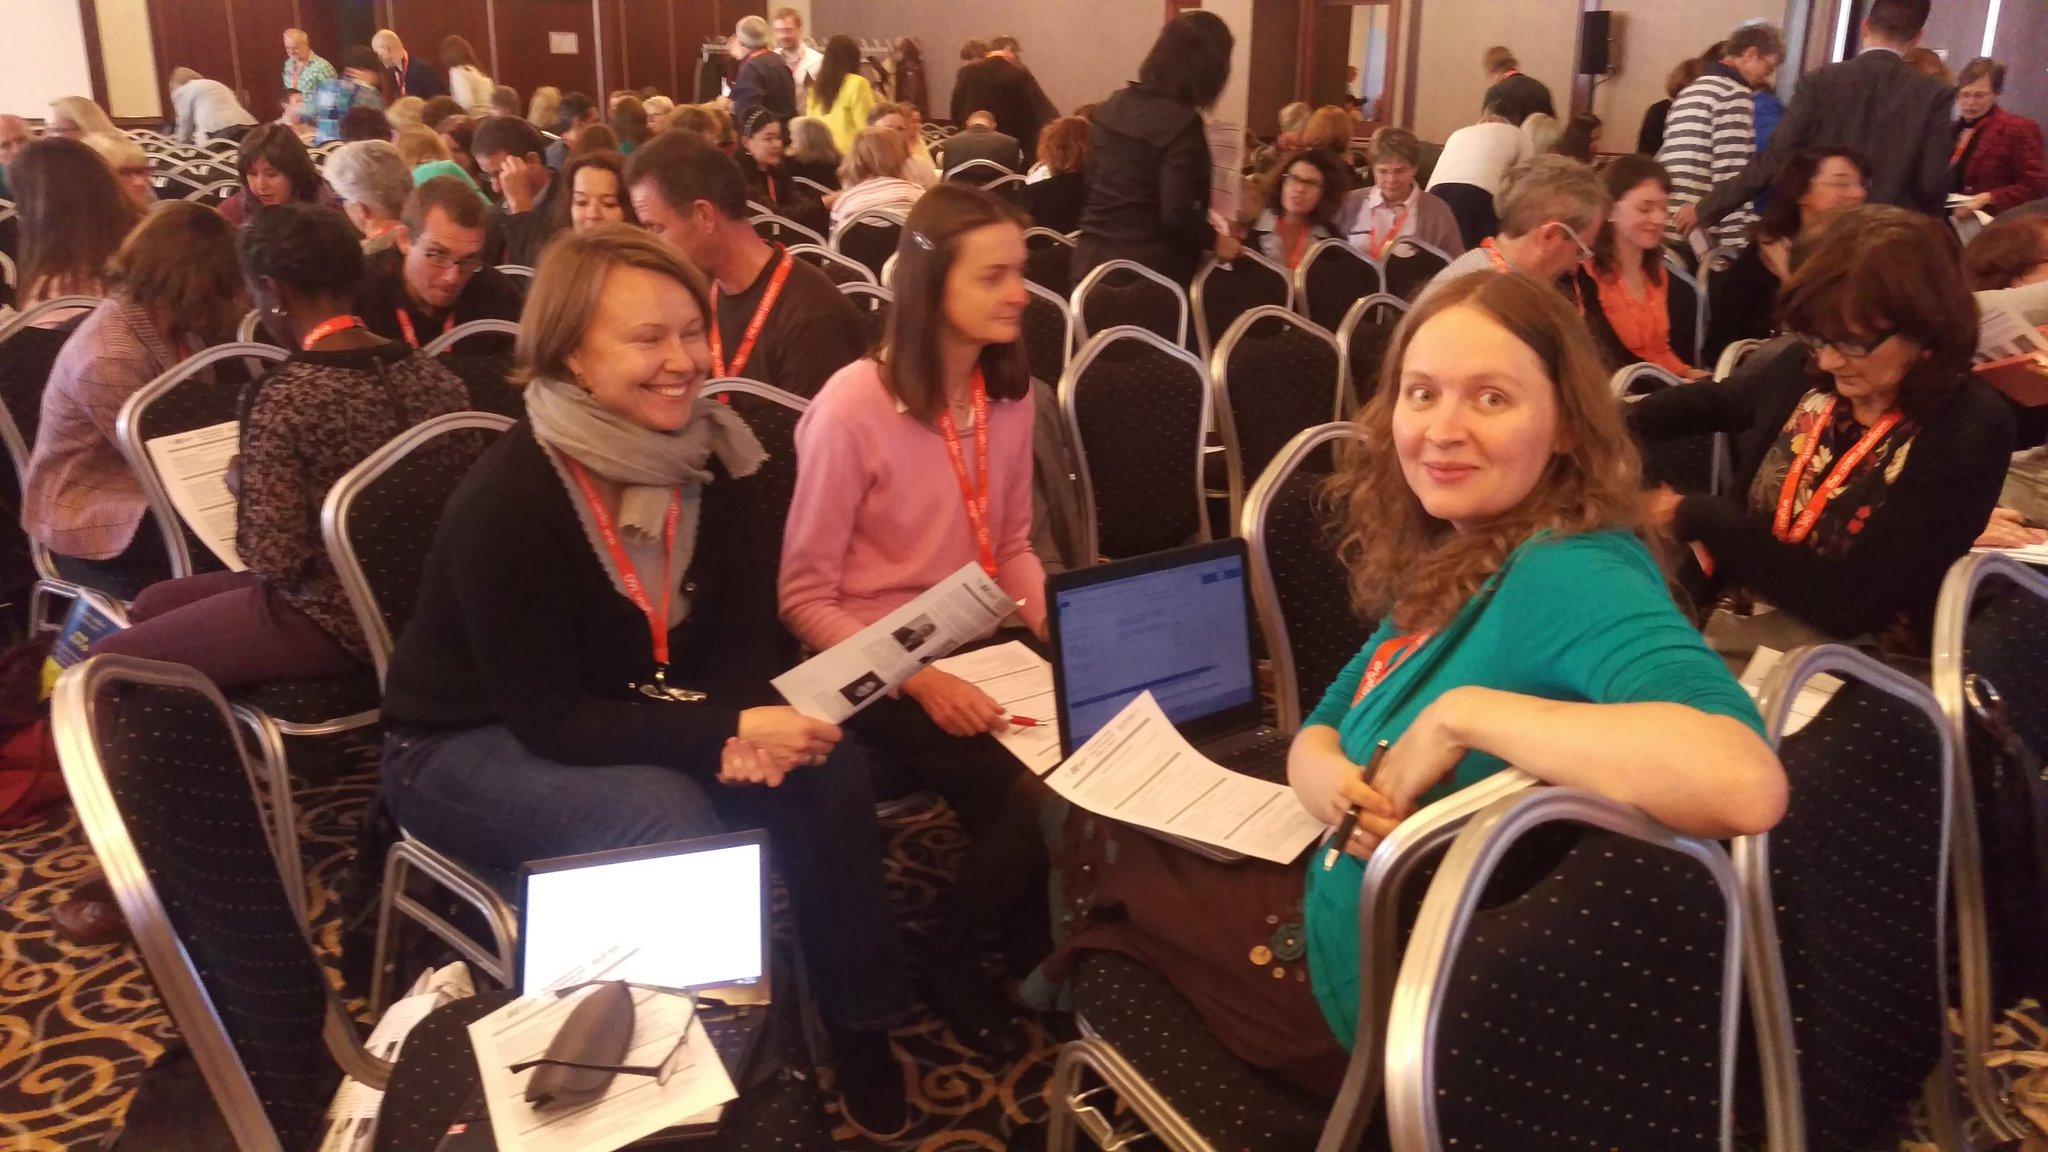 Woking in groups #IATEFL #BESIG Annual Conference #MAWSIG @MaWSIG https://t.co/OwGbaqHxXA